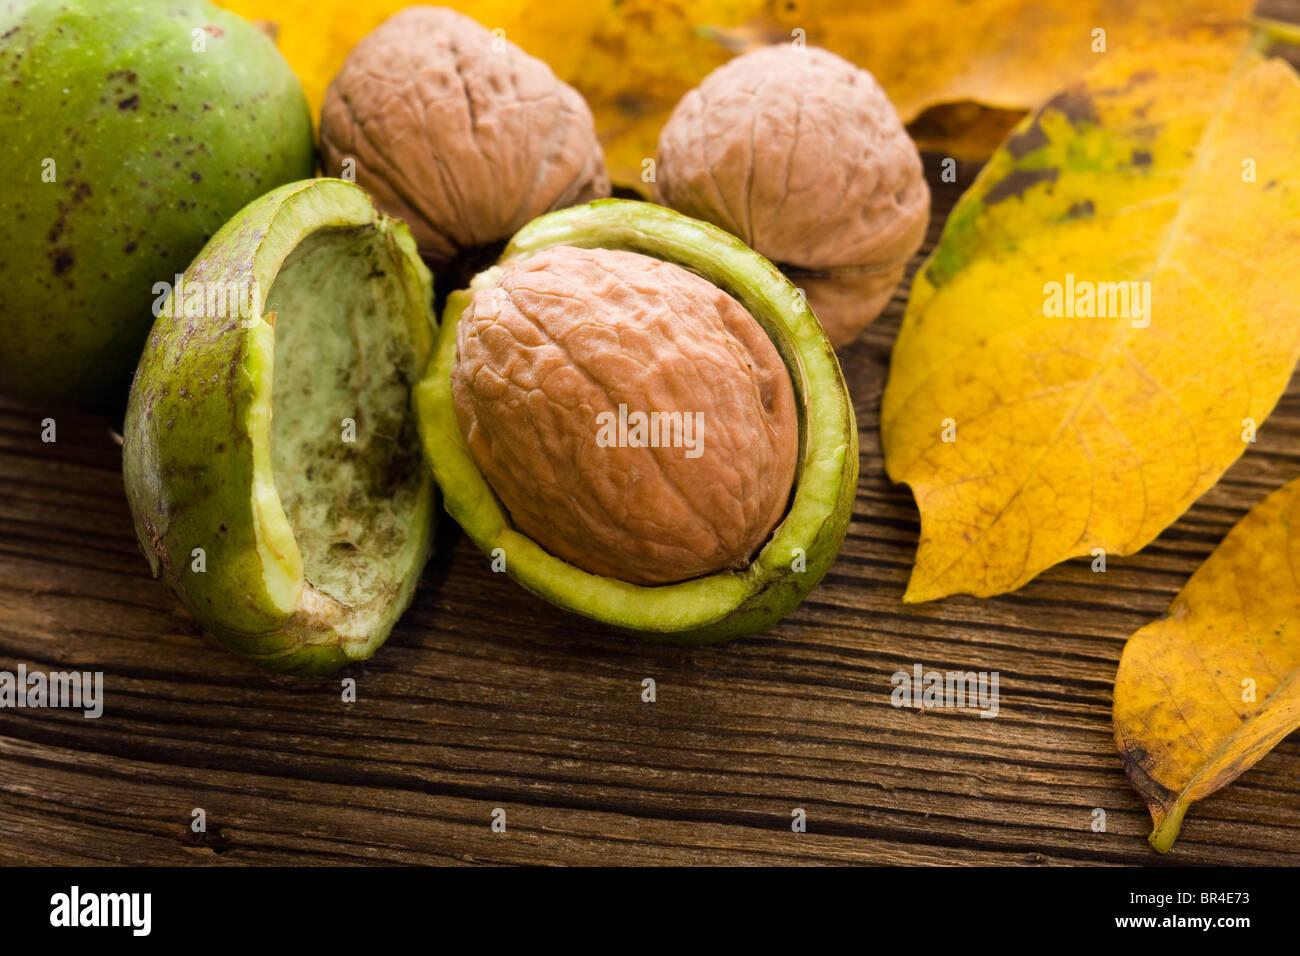 Autumn walnuts on wooden board - Stock Image